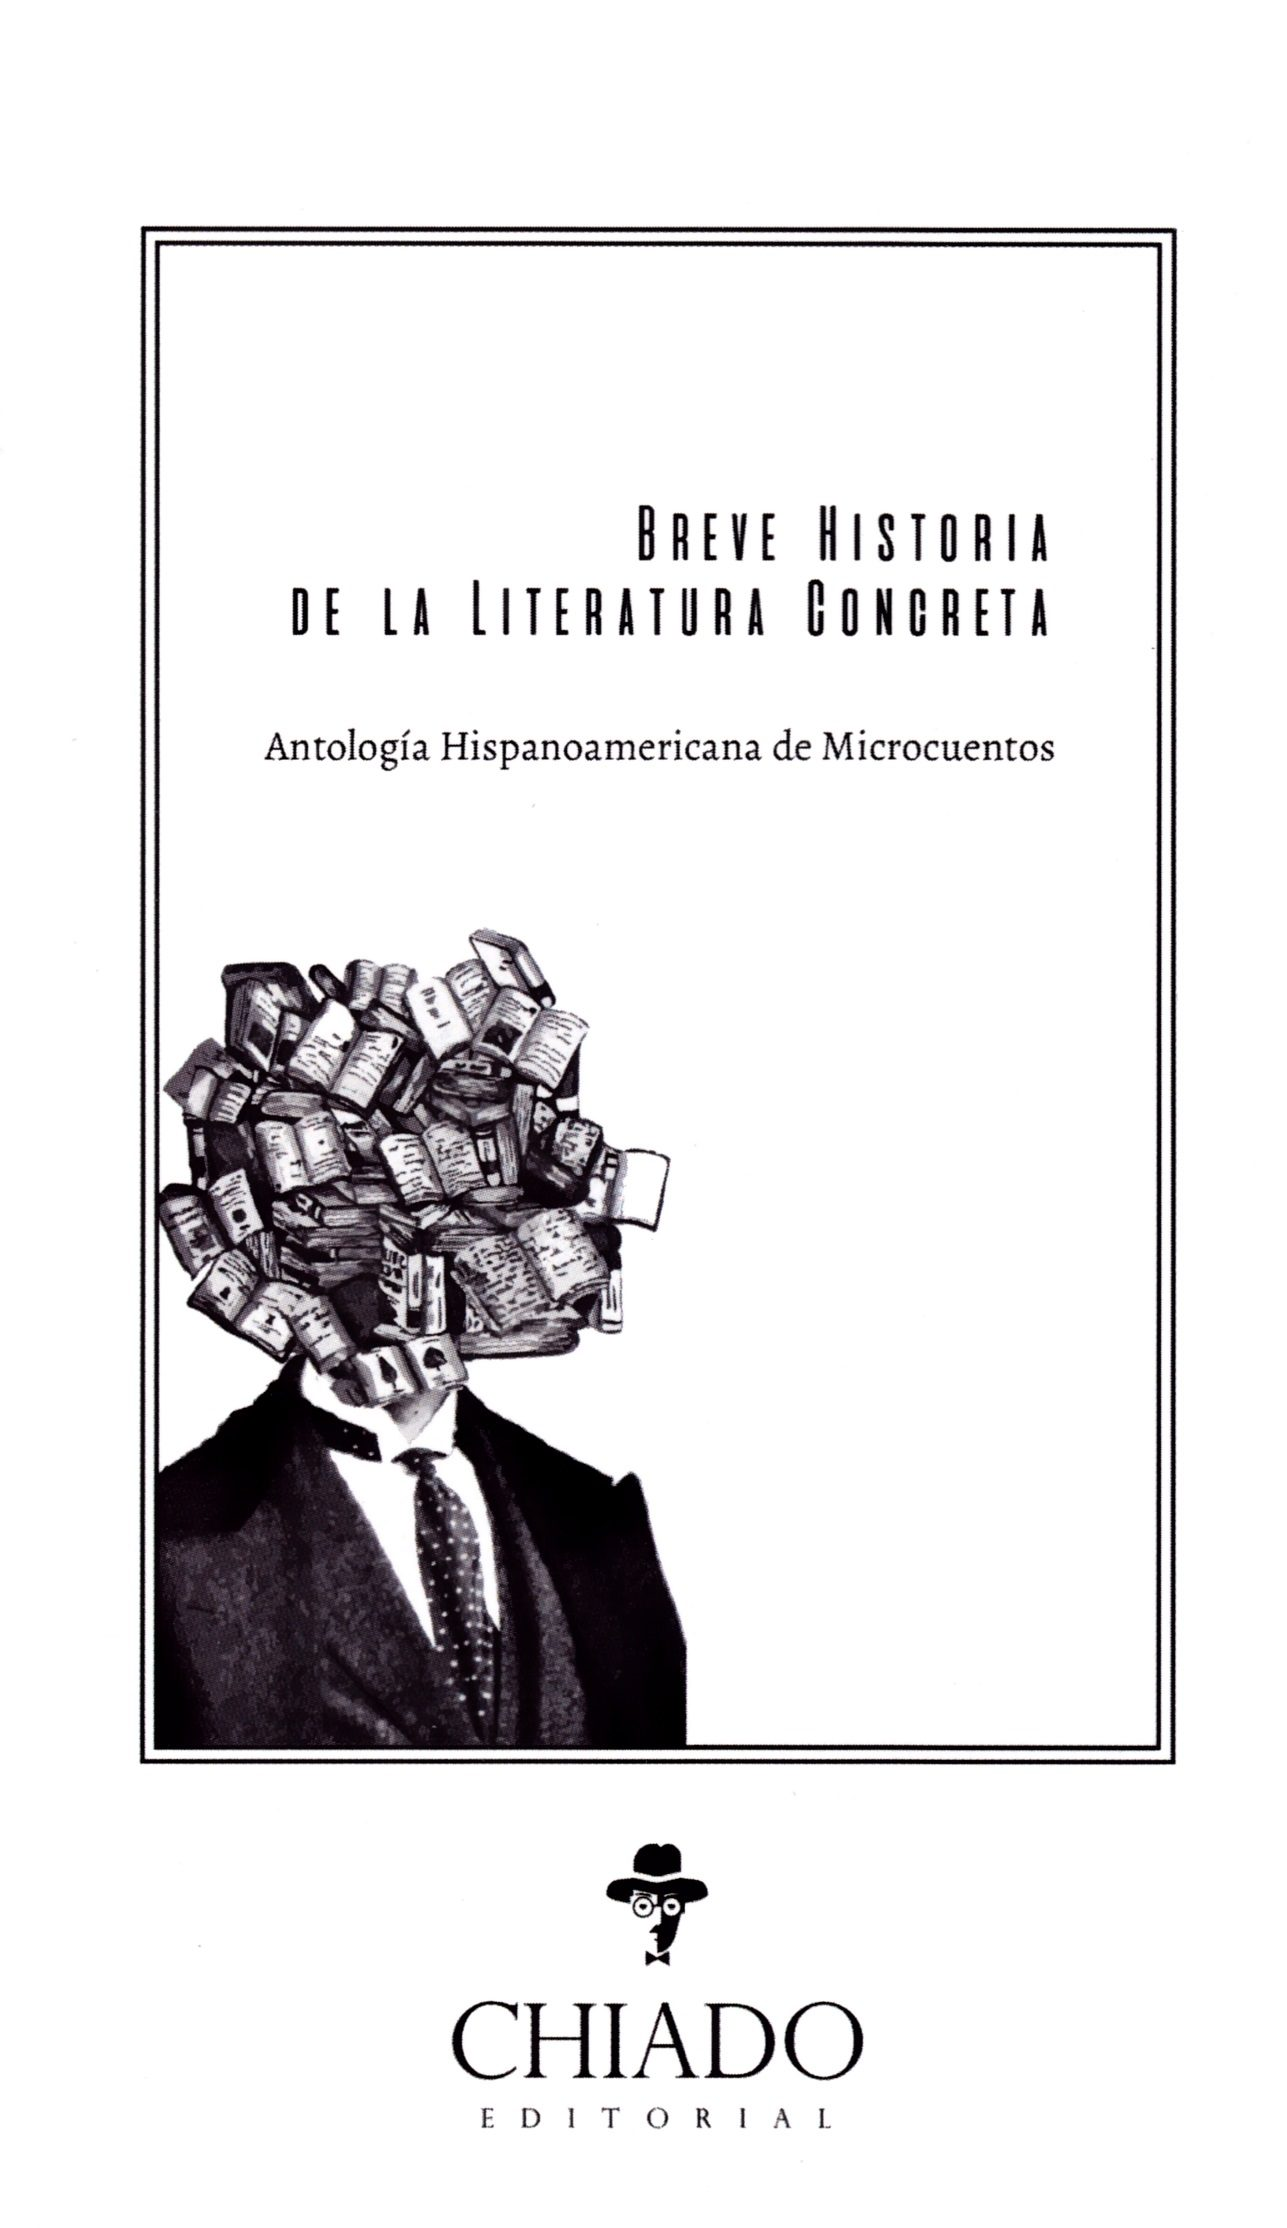 breve historia de la literatura concreta-9789895202508